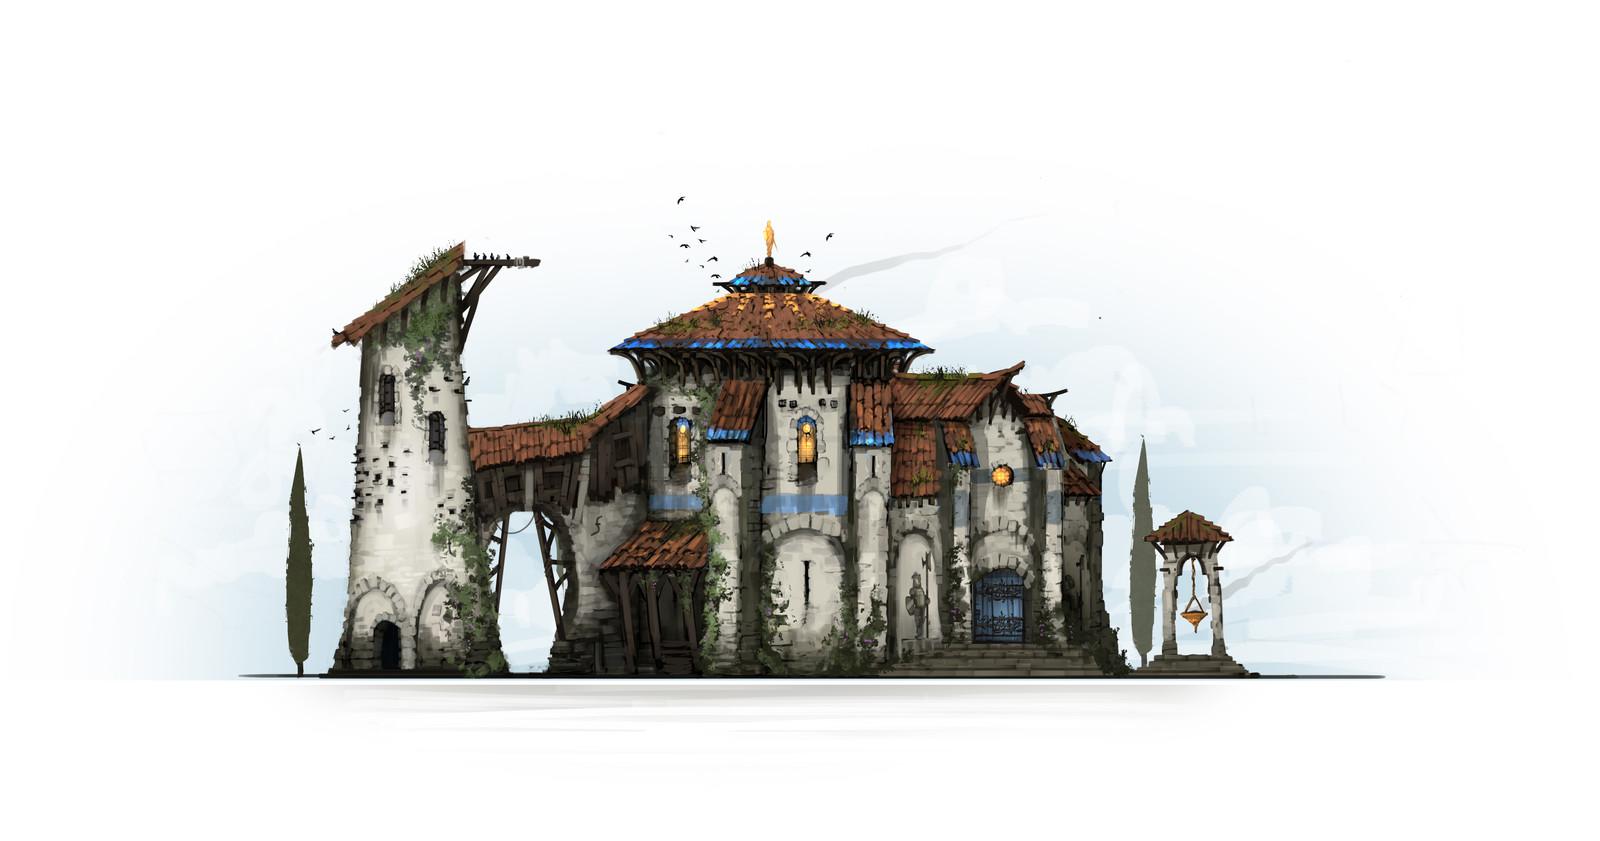 Concept of a Fantasy Provencal Architecure